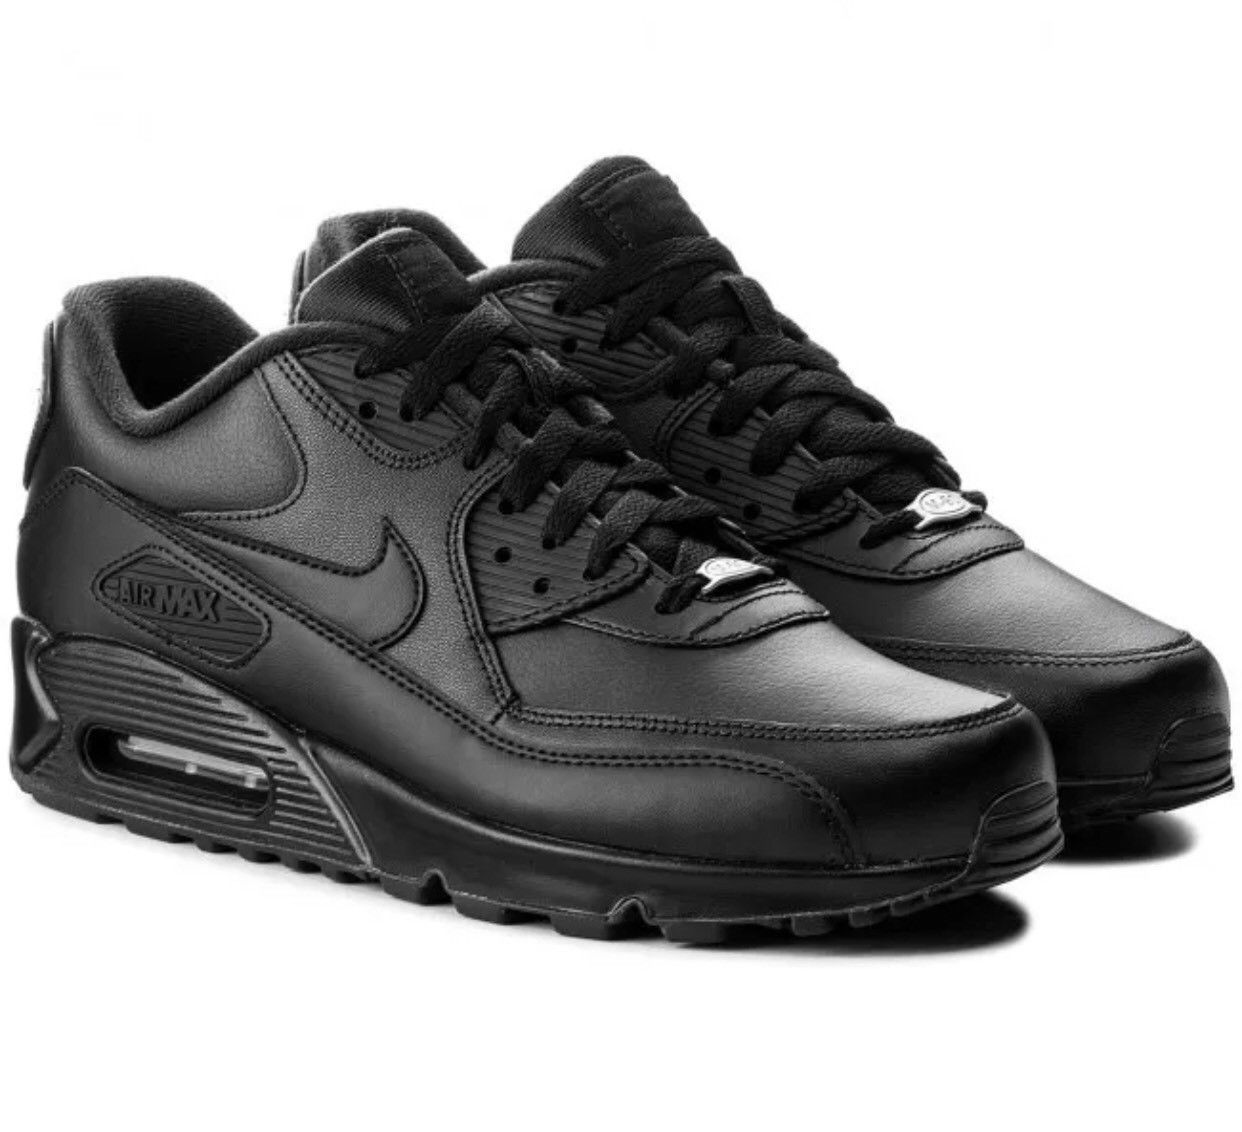 Nike Air Max 90 Leather Men's Shoes BlackMedium Olive